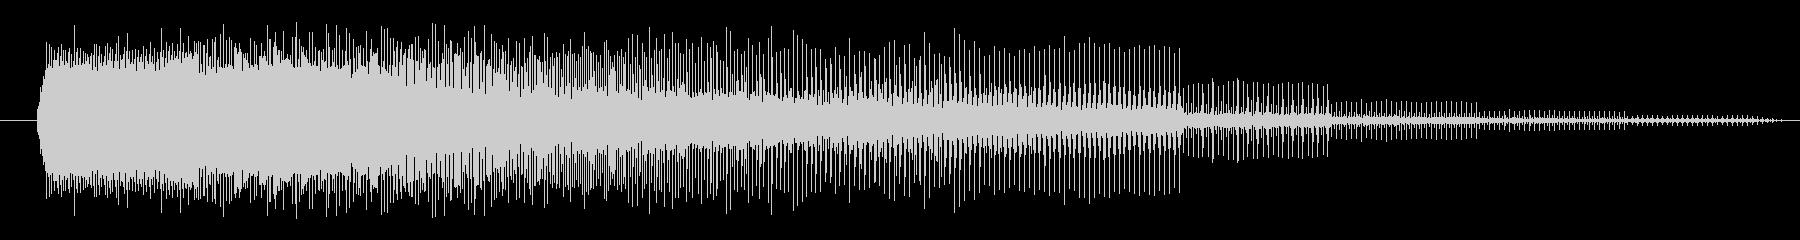 FX 合成ビームローディング01の未再生の波形